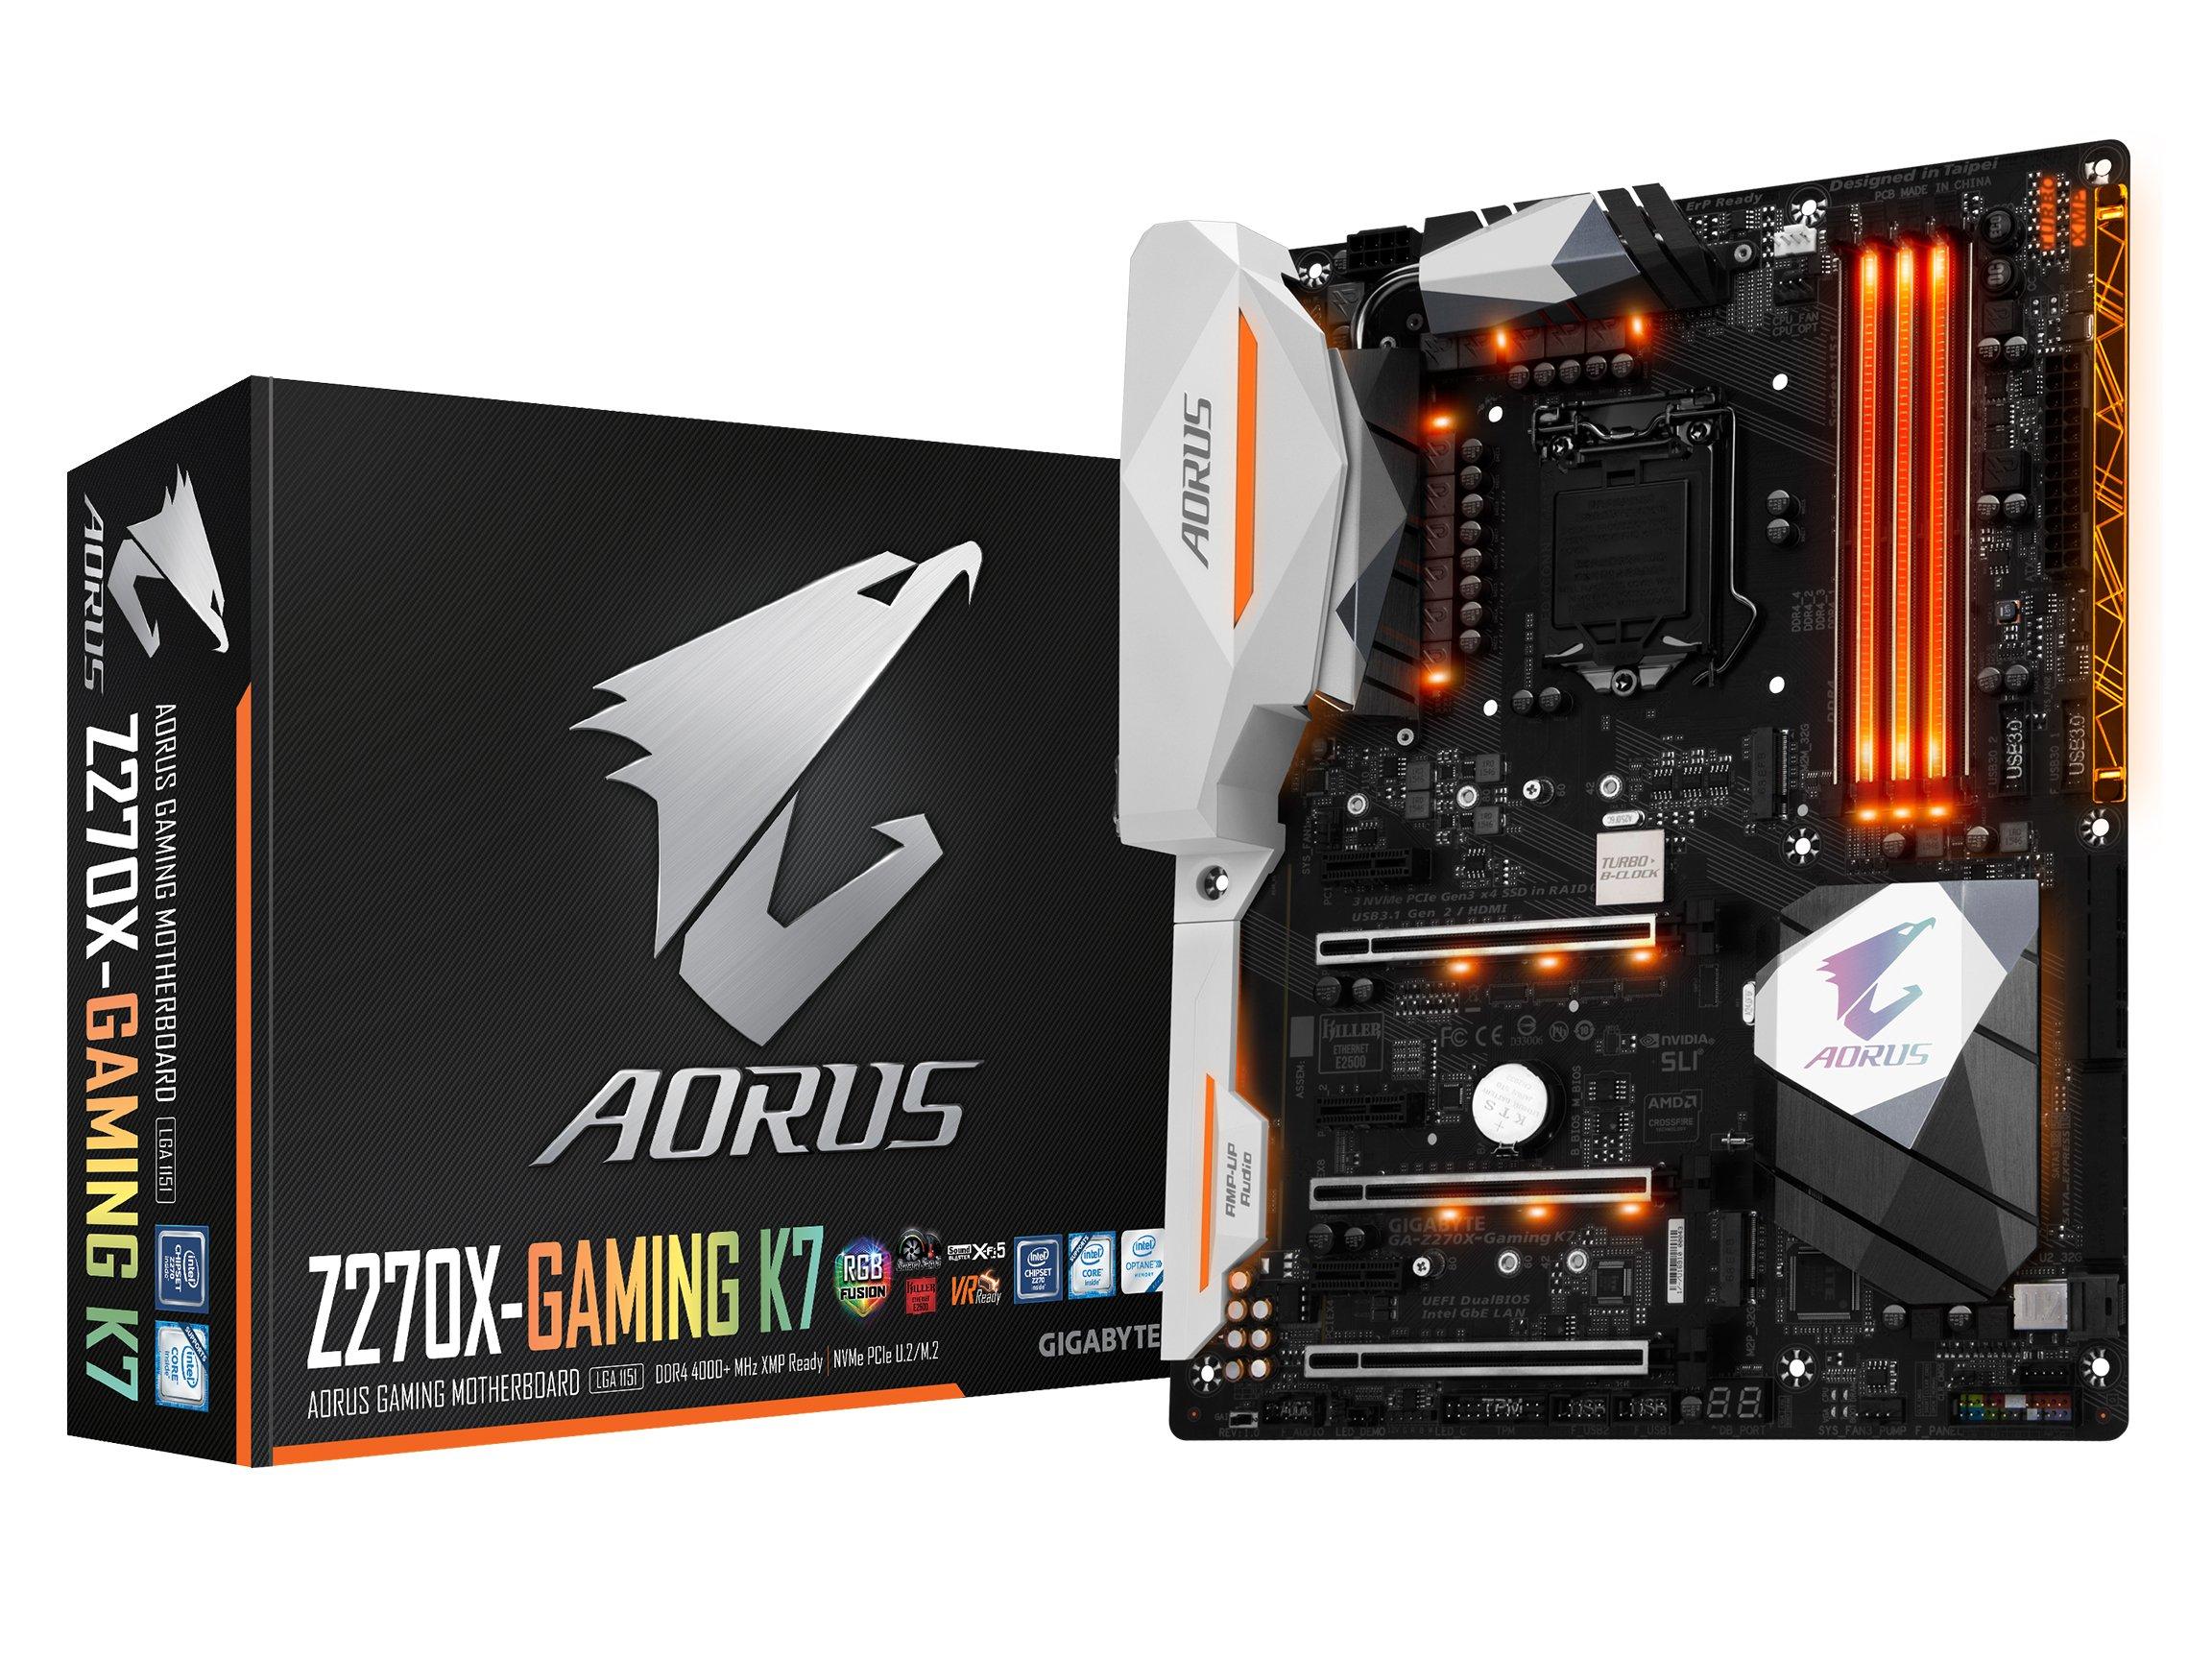 GIGABYTE AORUS GA-Z270X-Gaming K7 Gaming Motherboard LGA1151 Intel Z270 2-Way SLI ATX DDR4 Motherboard by Gigabyte